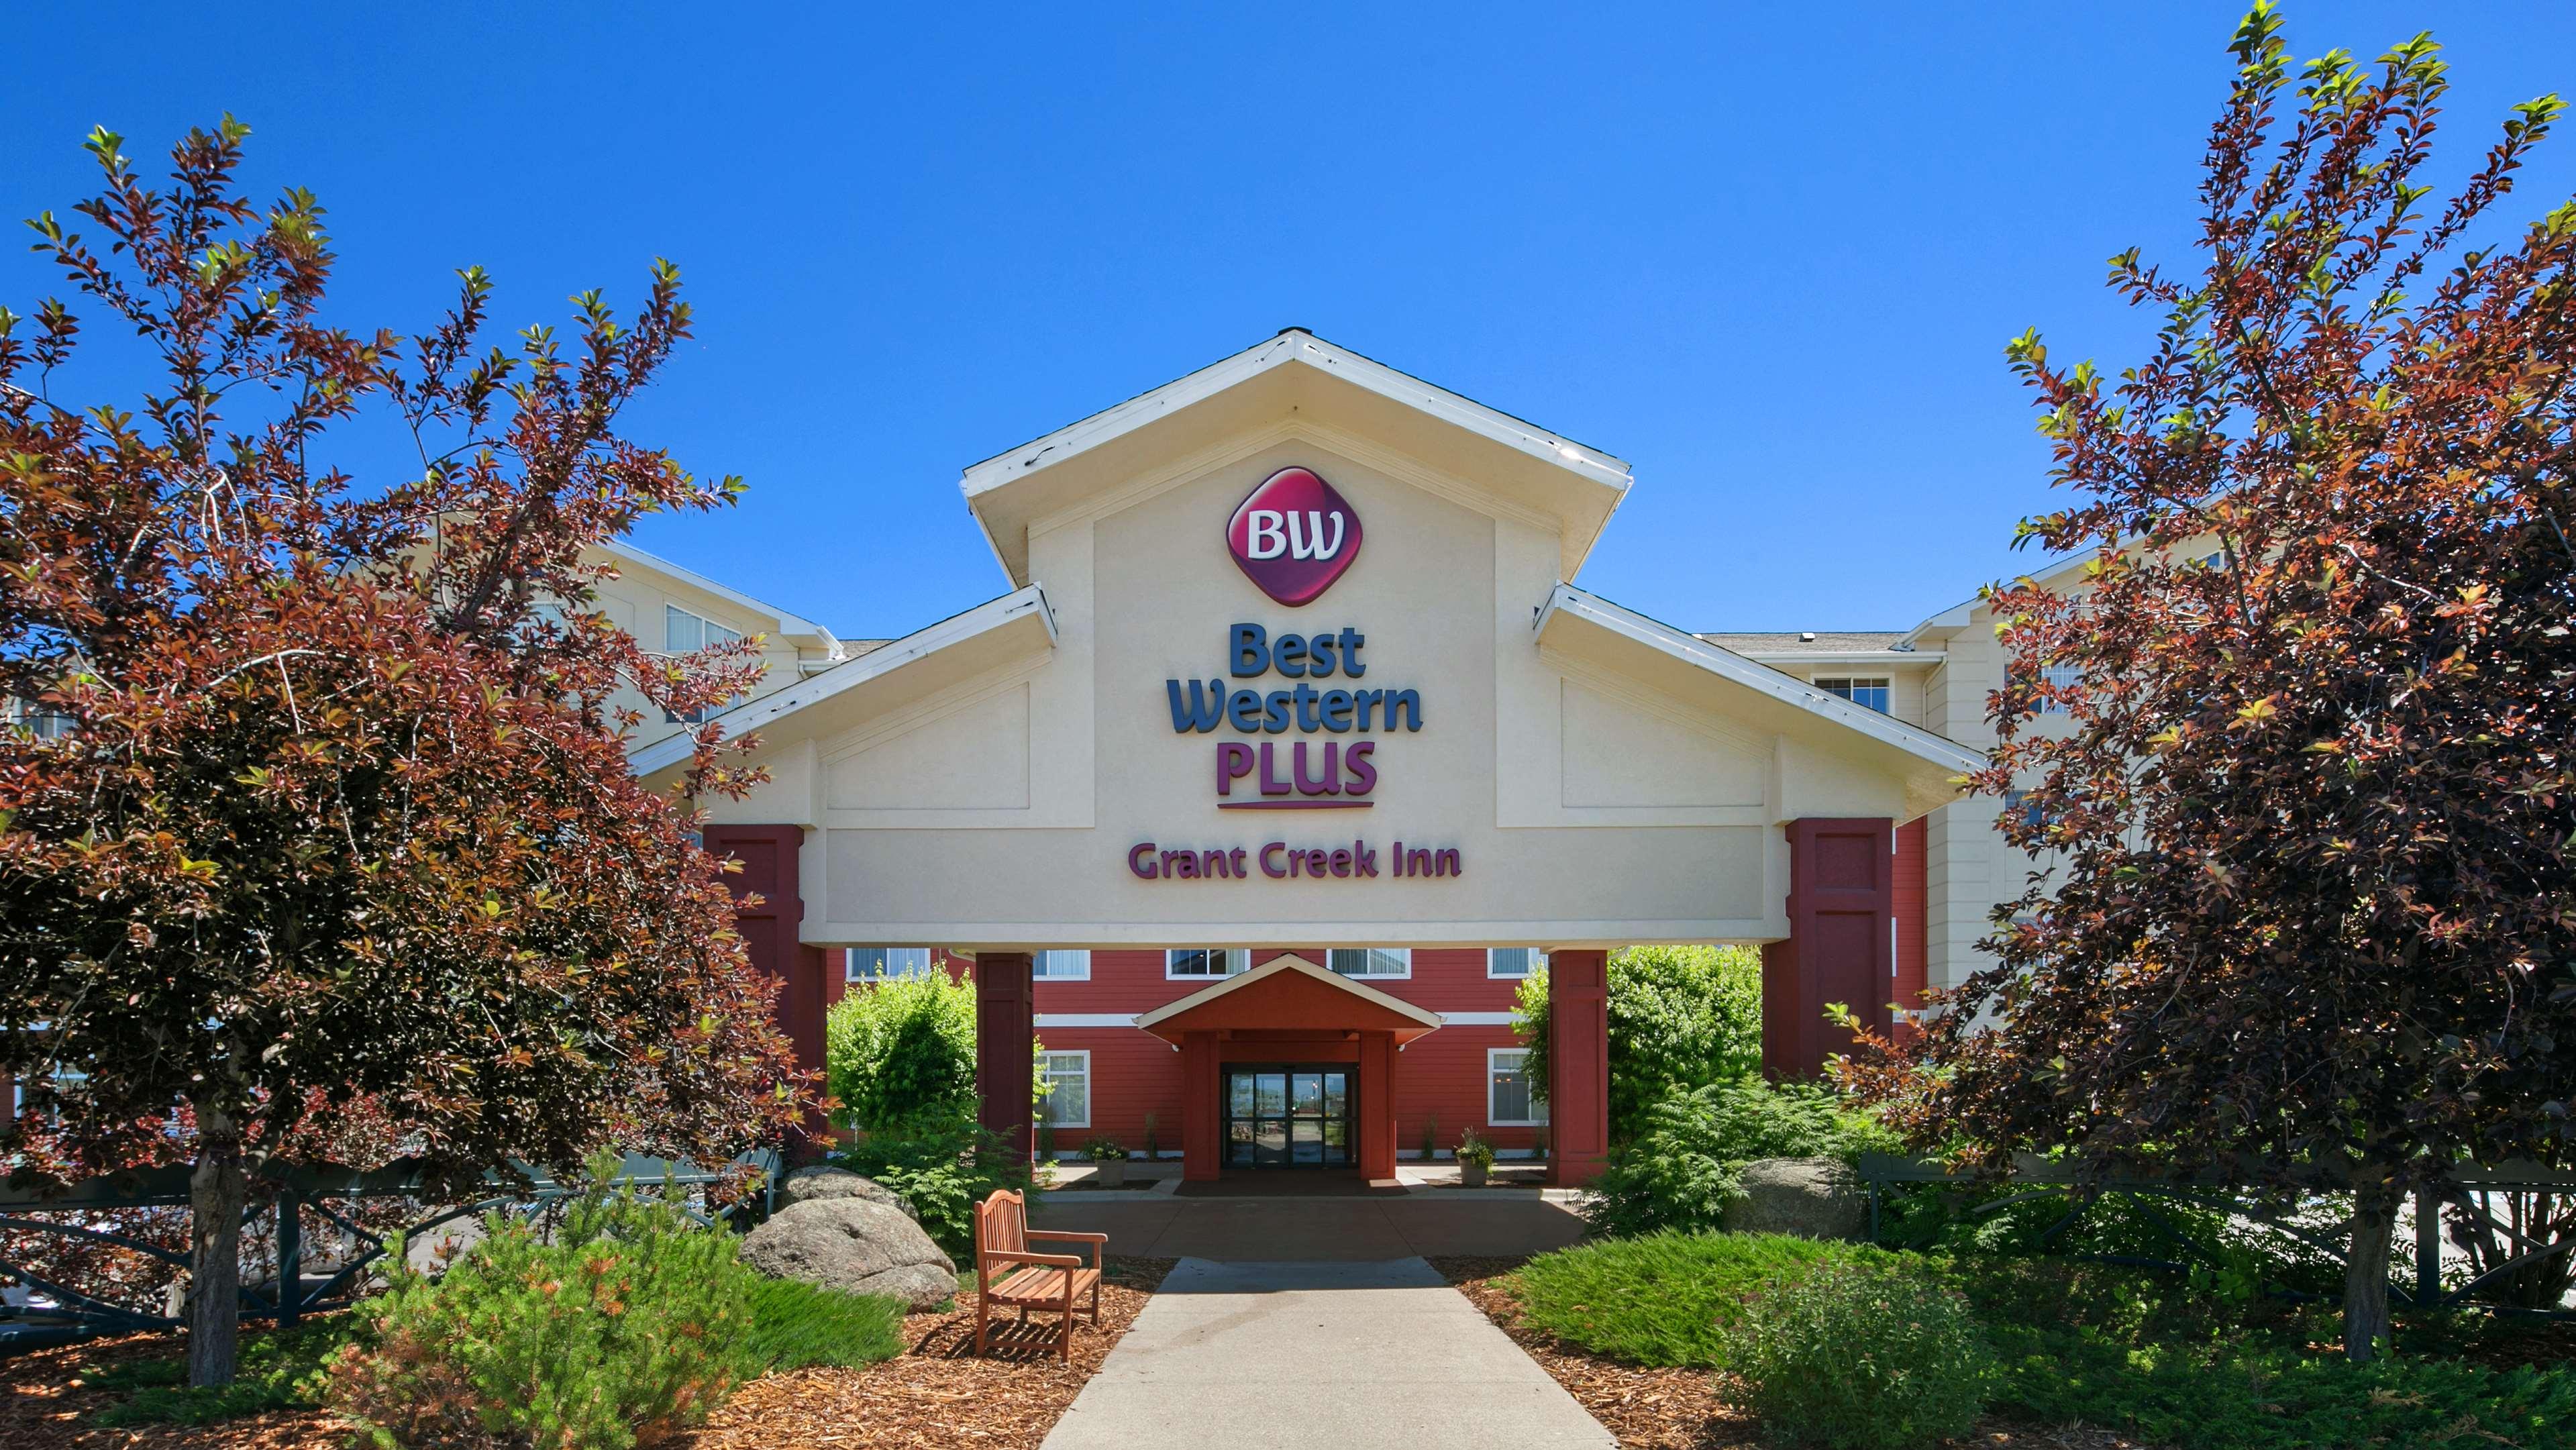 Silver Creek Casino At Hilton Garden Inn Missoula. Silver Creek Casino At Hilton  Garden Inn Missoula Is A Poker Room In Montana Dealing.